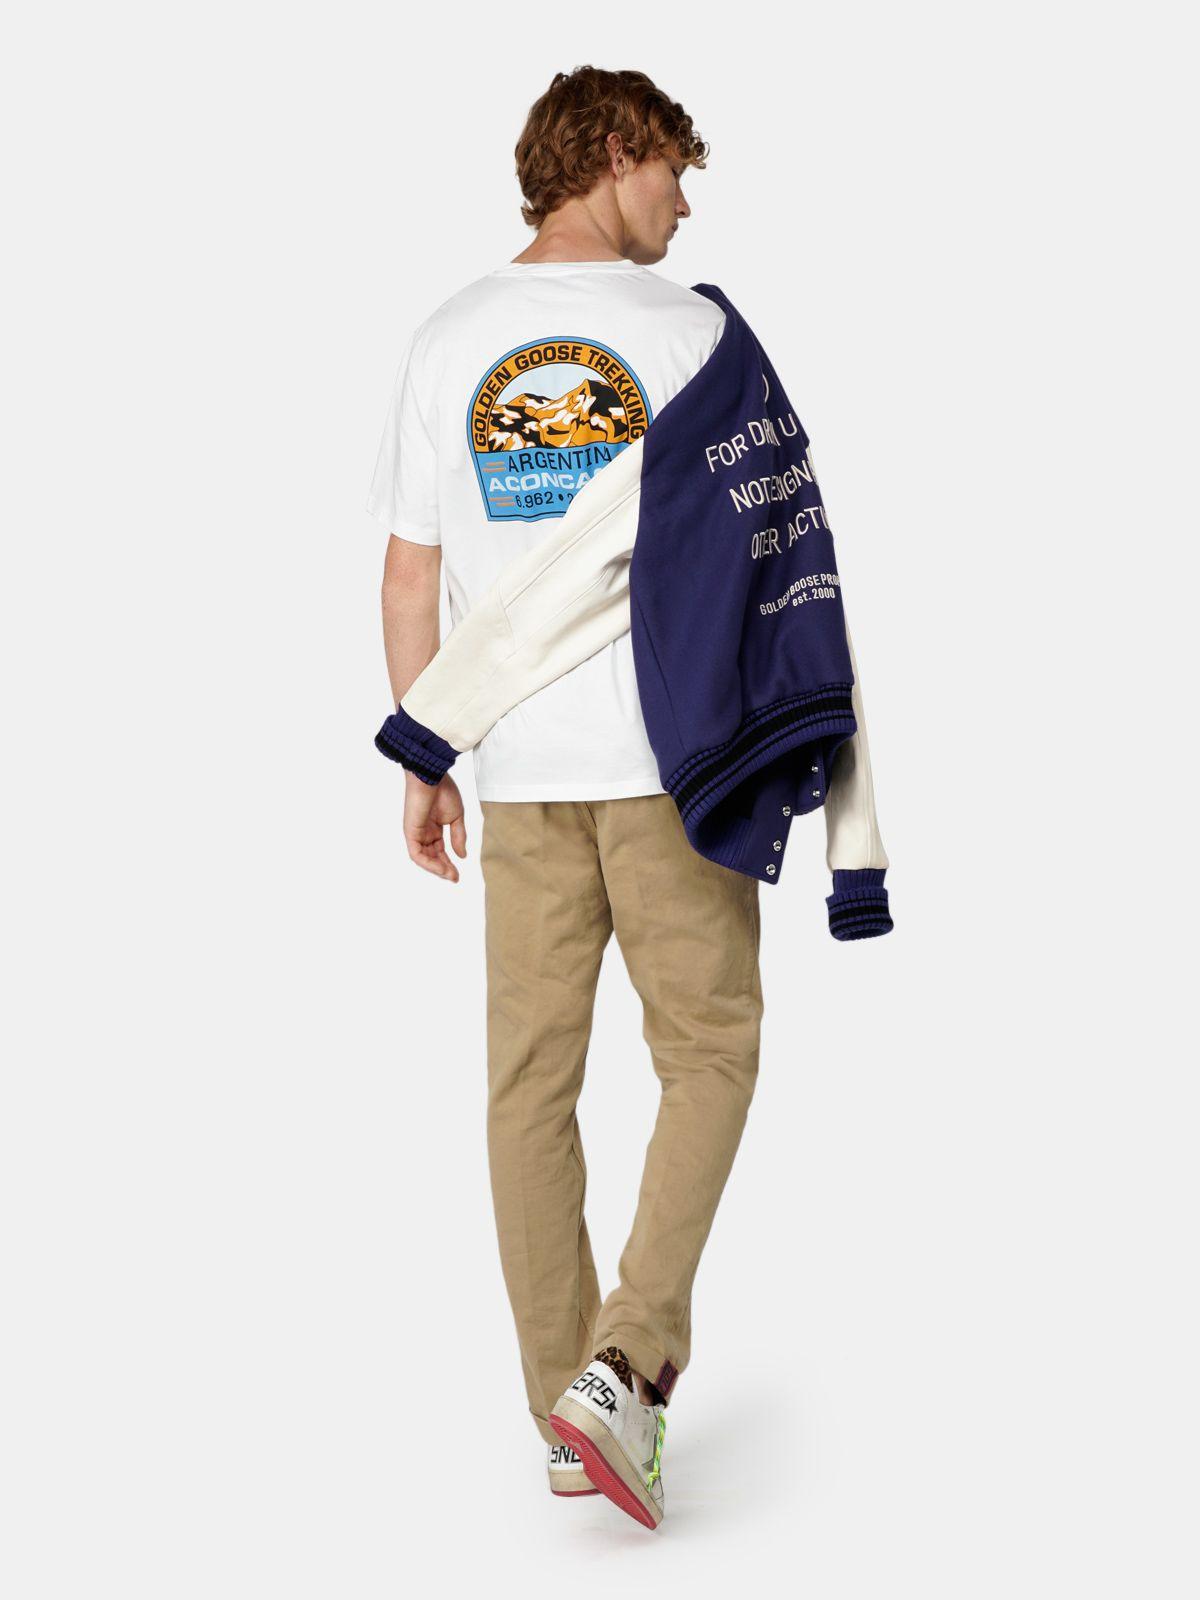 Golden Goose - Adamo T-shirt with Argentina print in